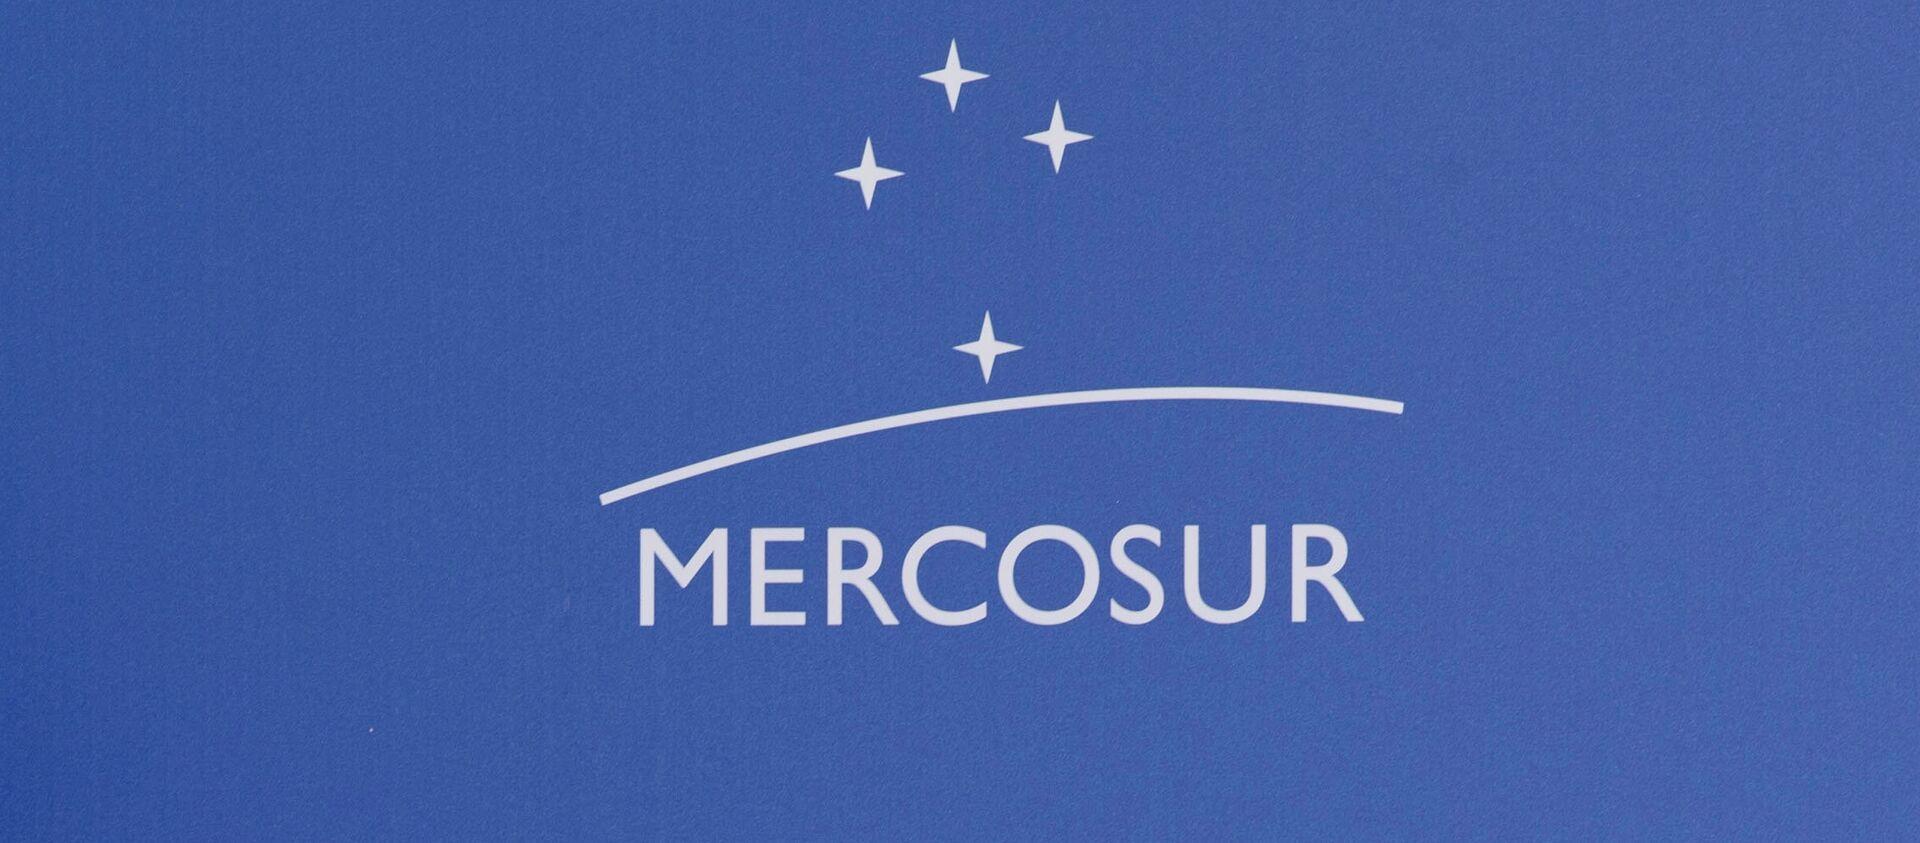 Un guardia de honor durante la Cumbre de Mercosur (archivo) - Sputnik Mundo, 1920, 27.08.2020